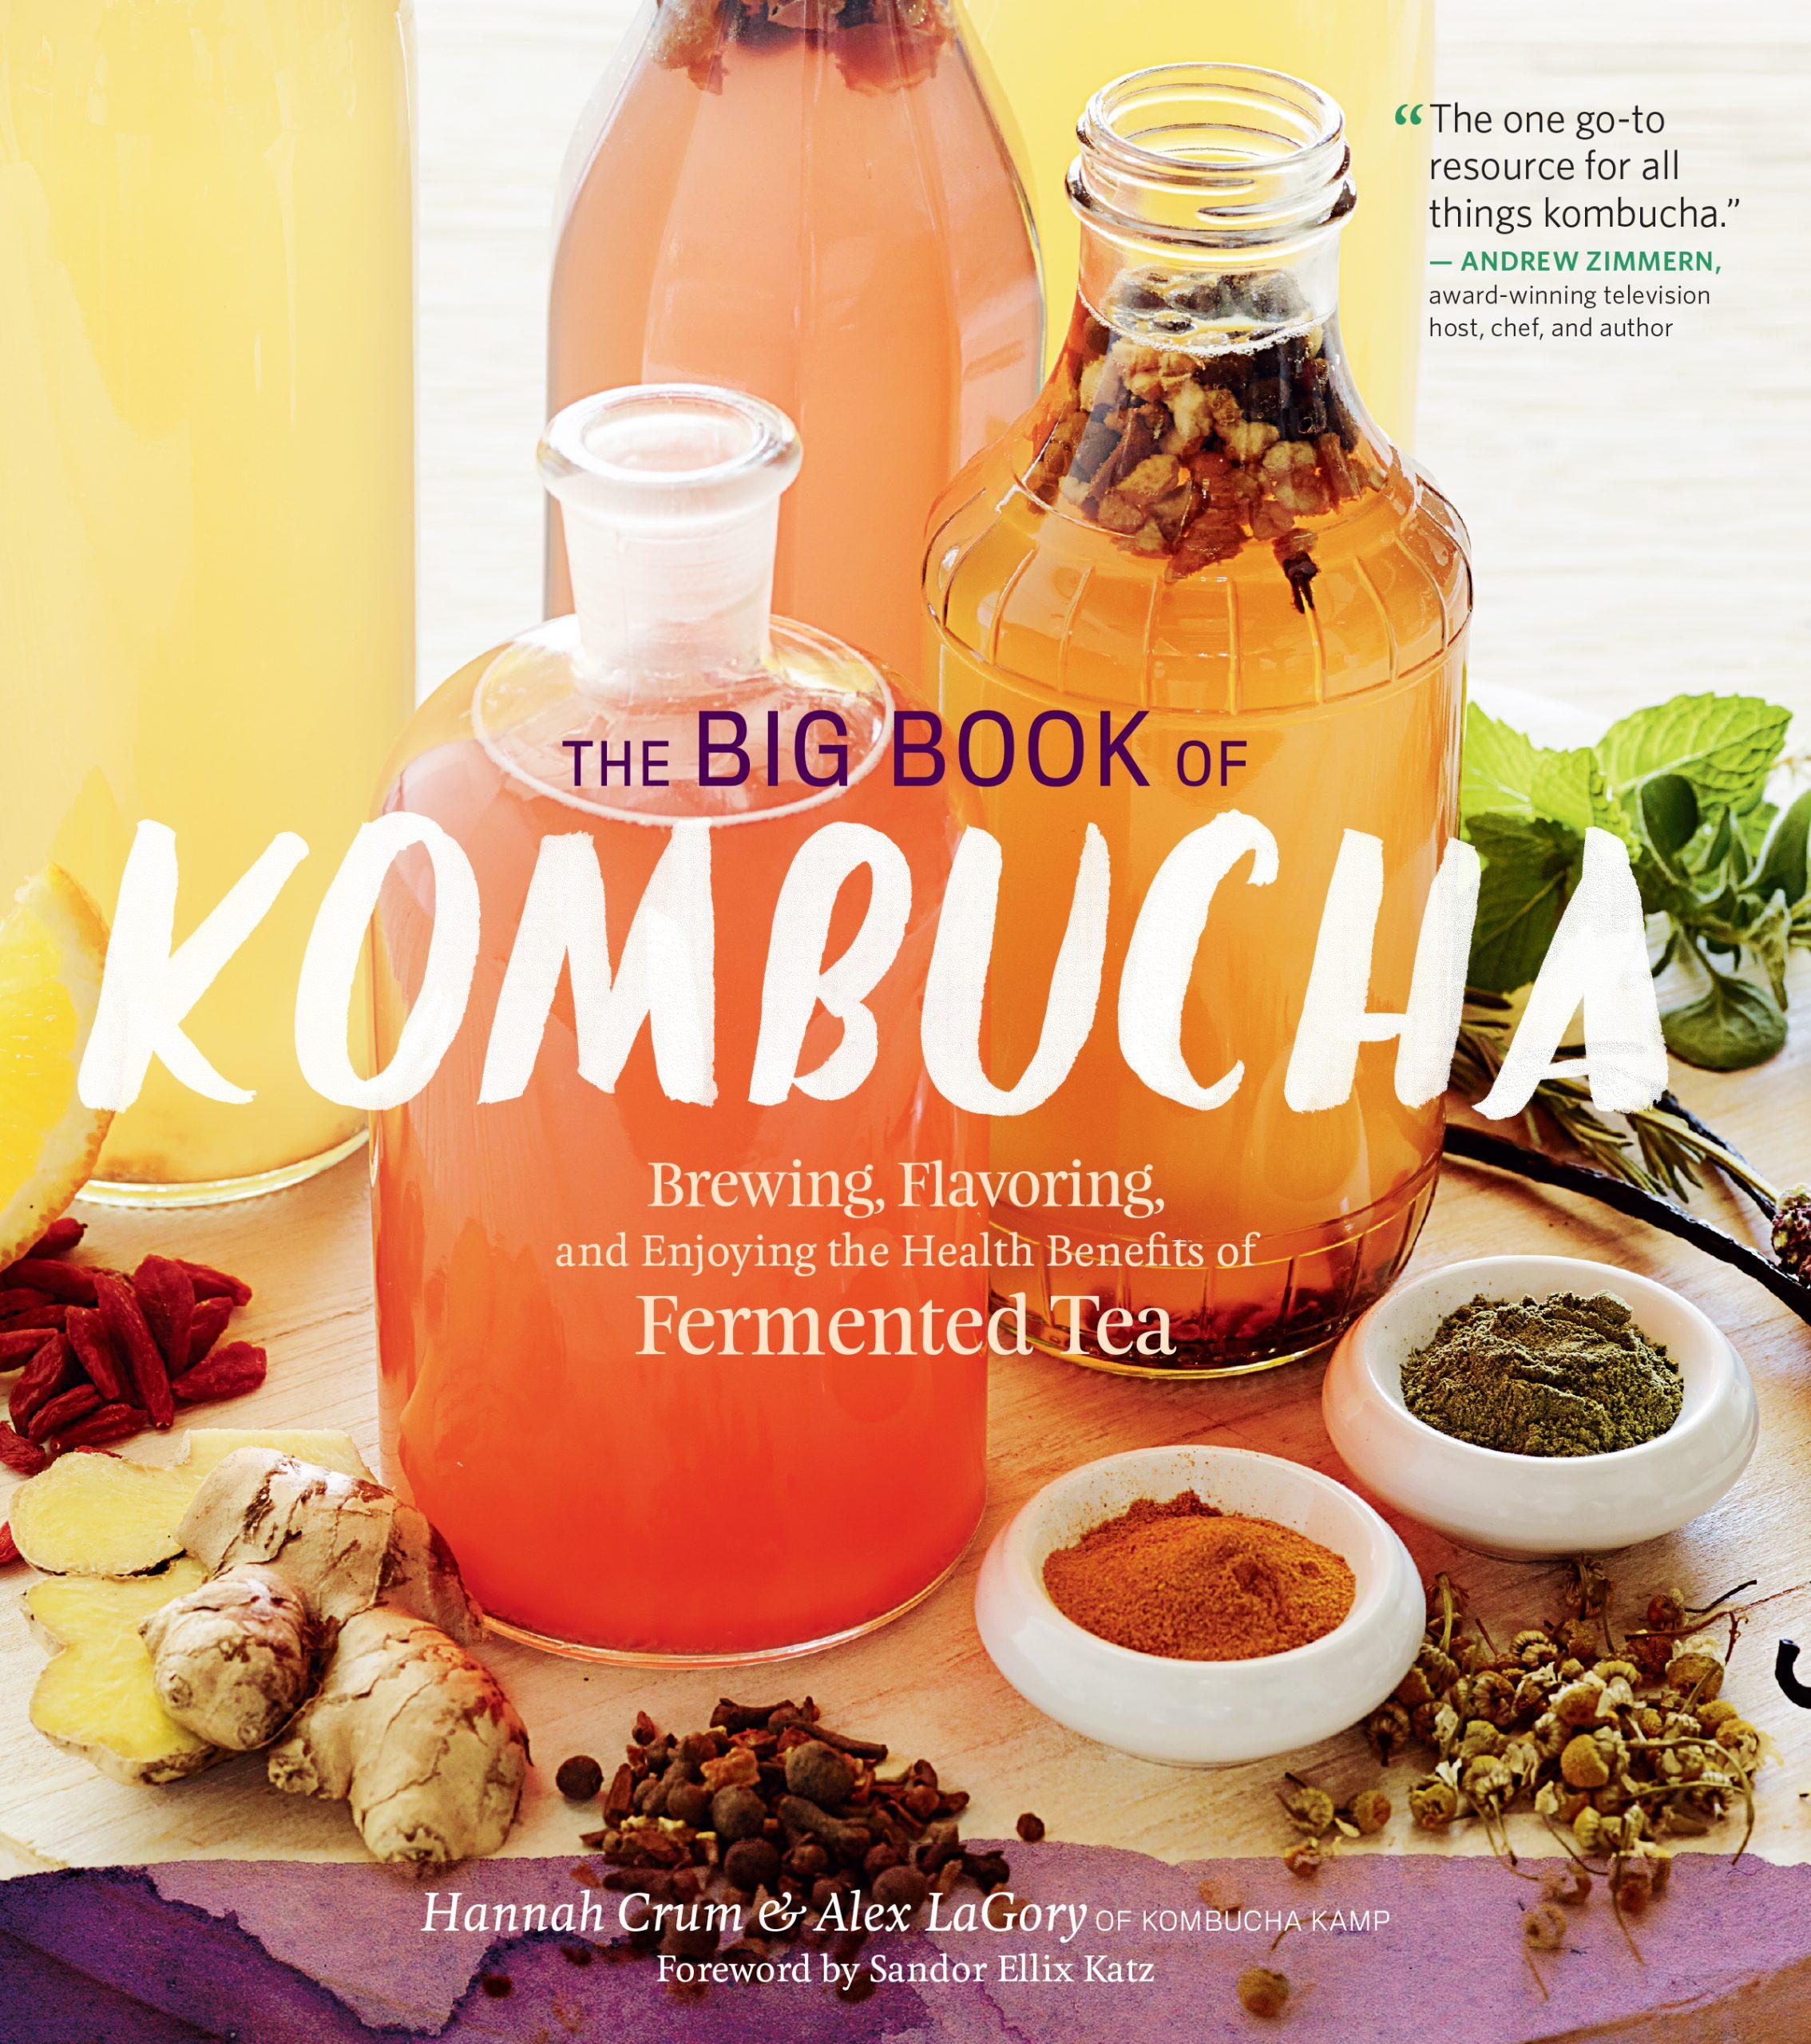 The Big Book of:Kombucha (1)